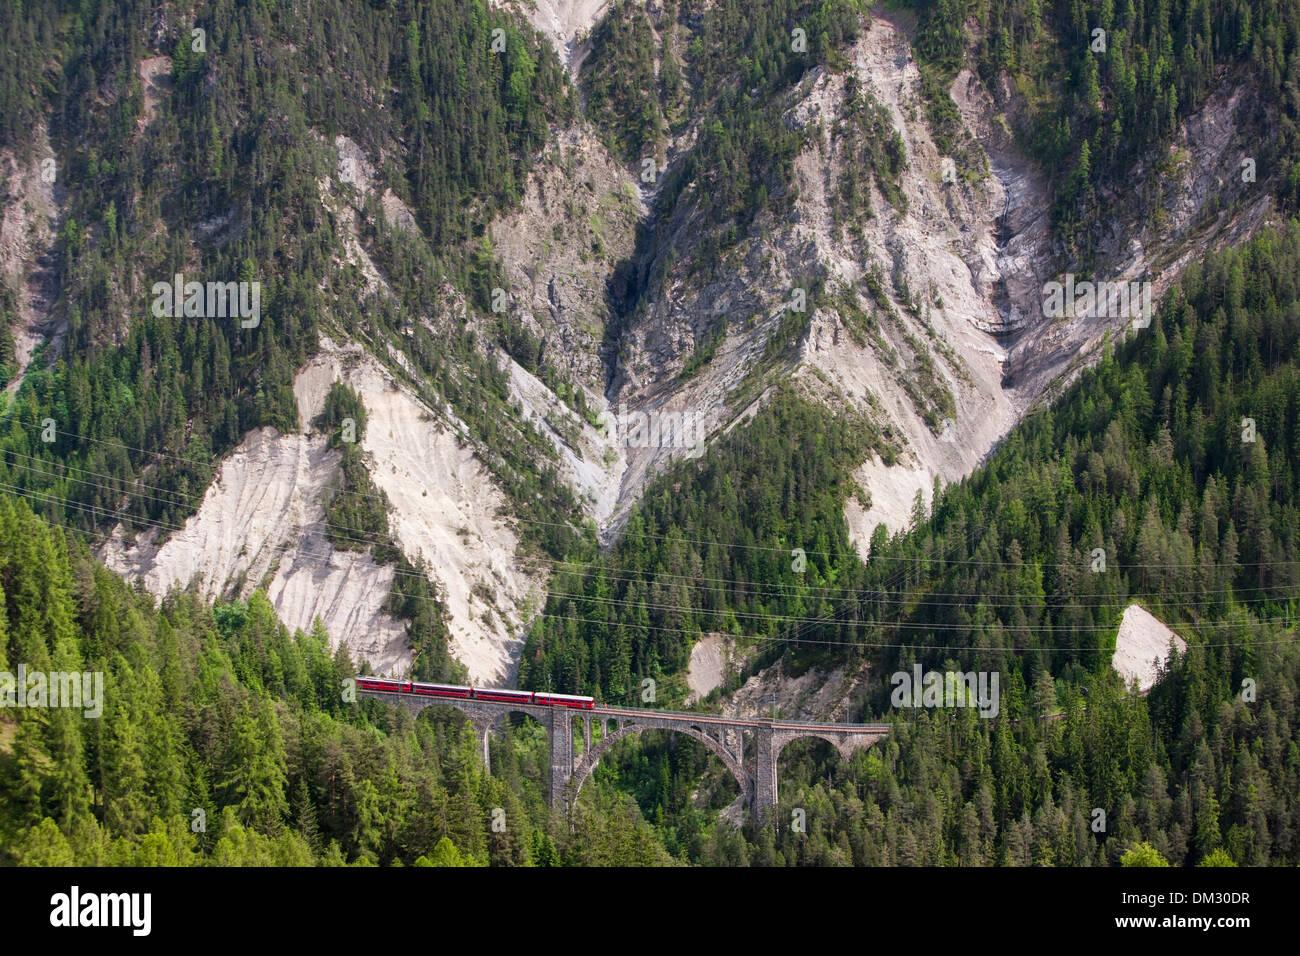 Switzerland Europe railway train railroad mountain mountains